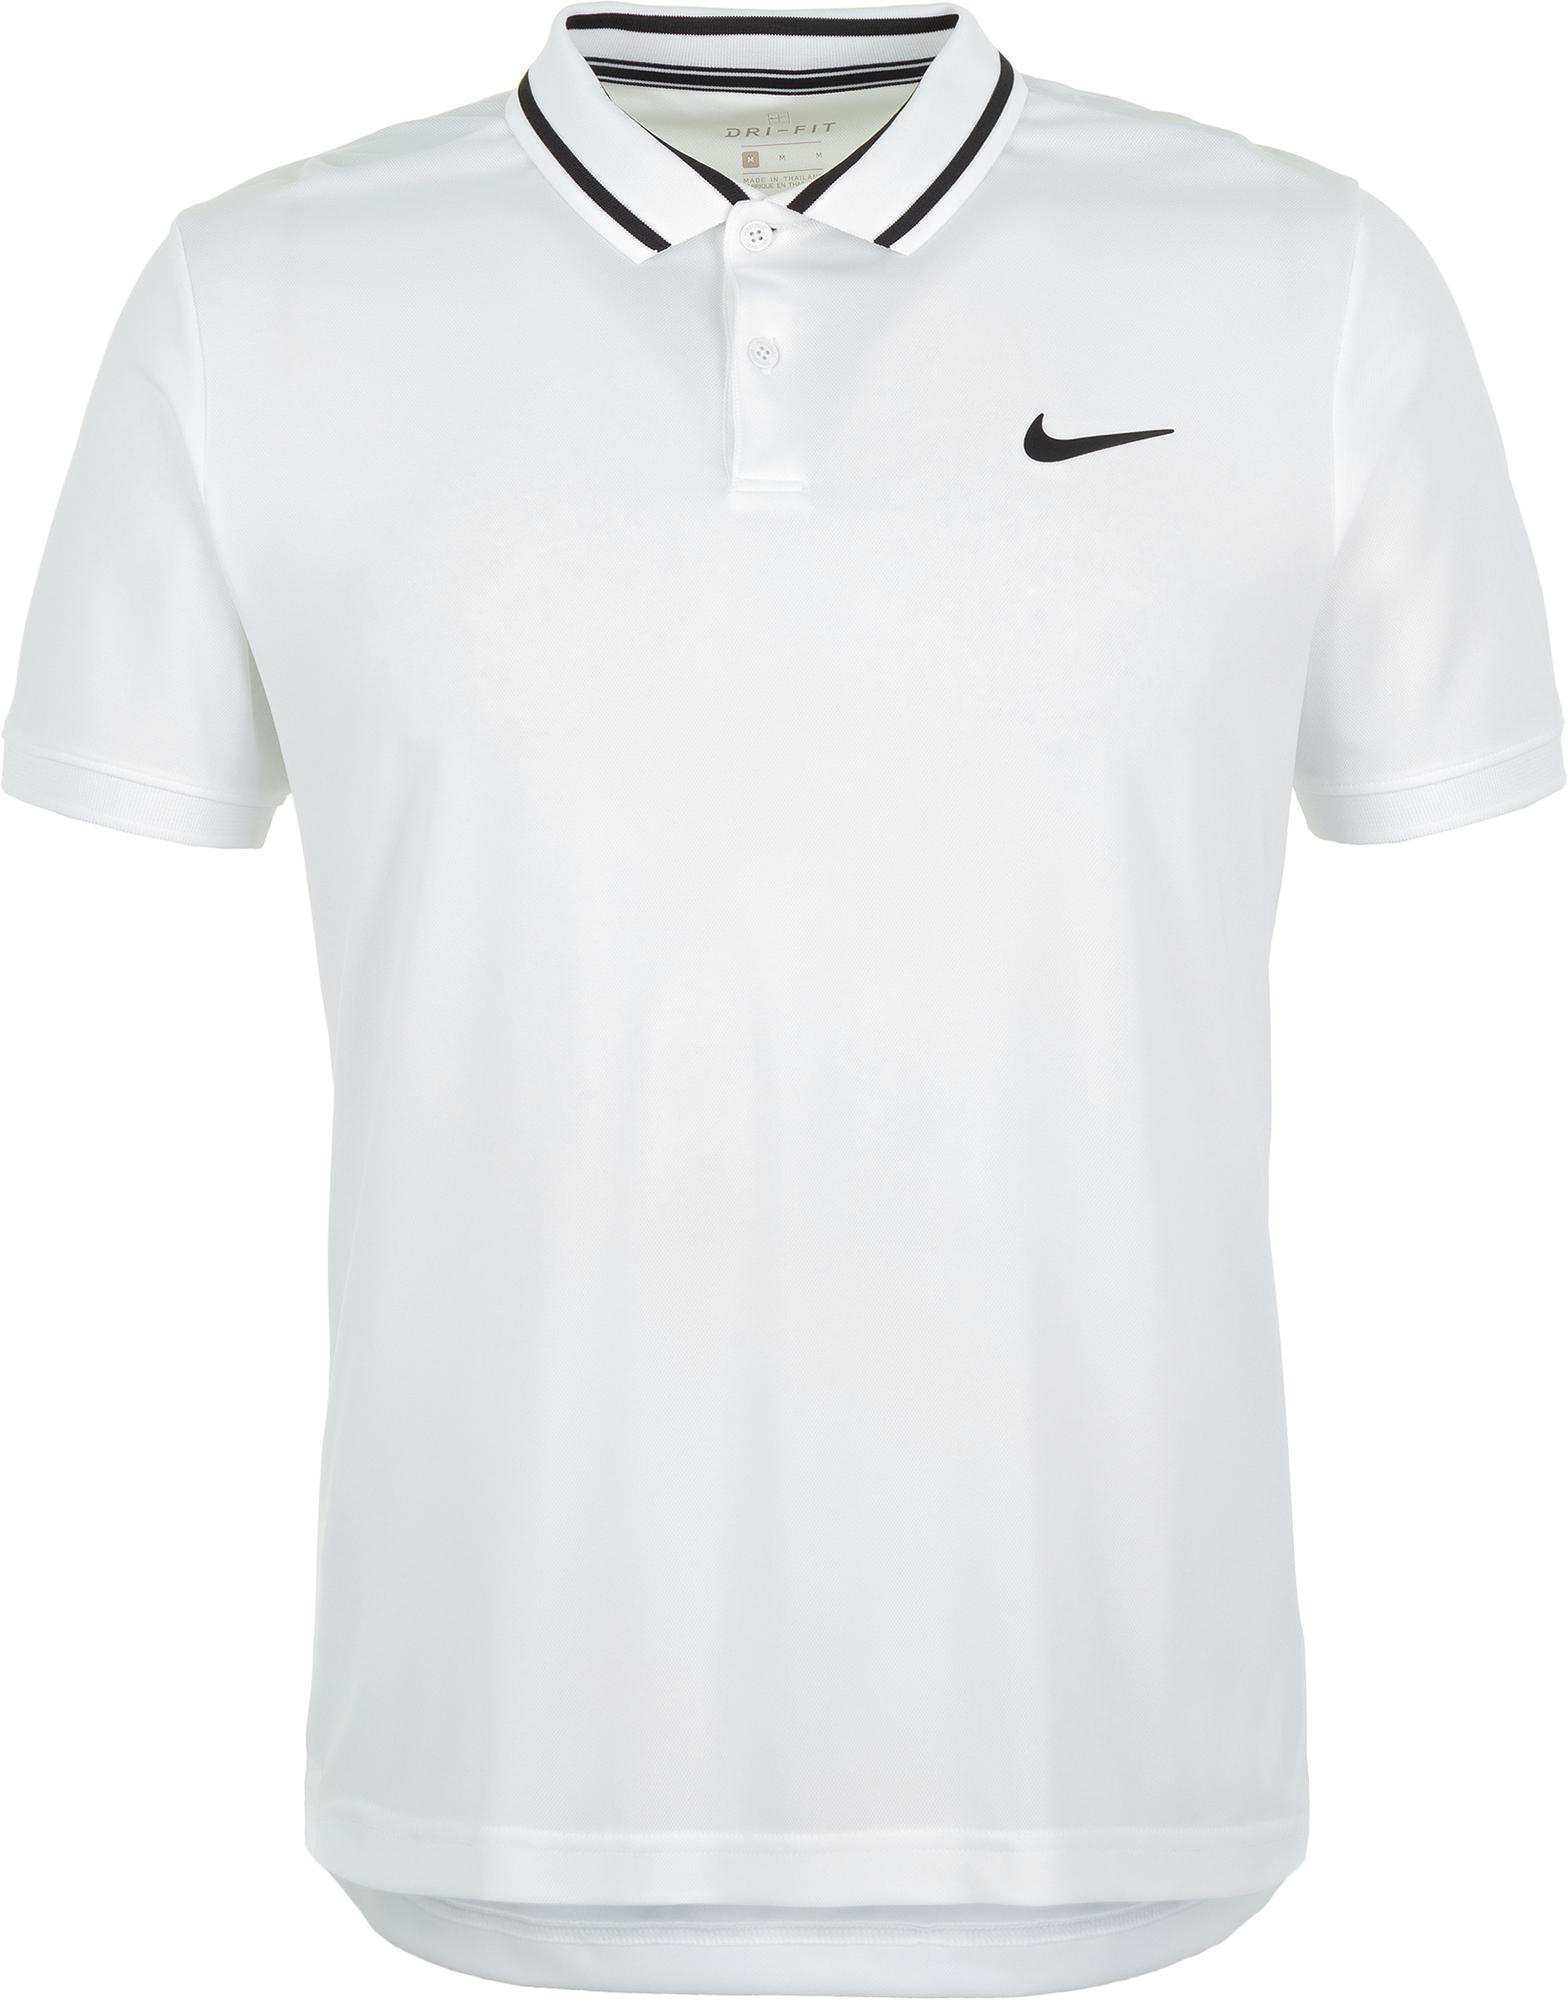 Nike Поло мужское Court Dry, размер 52-54